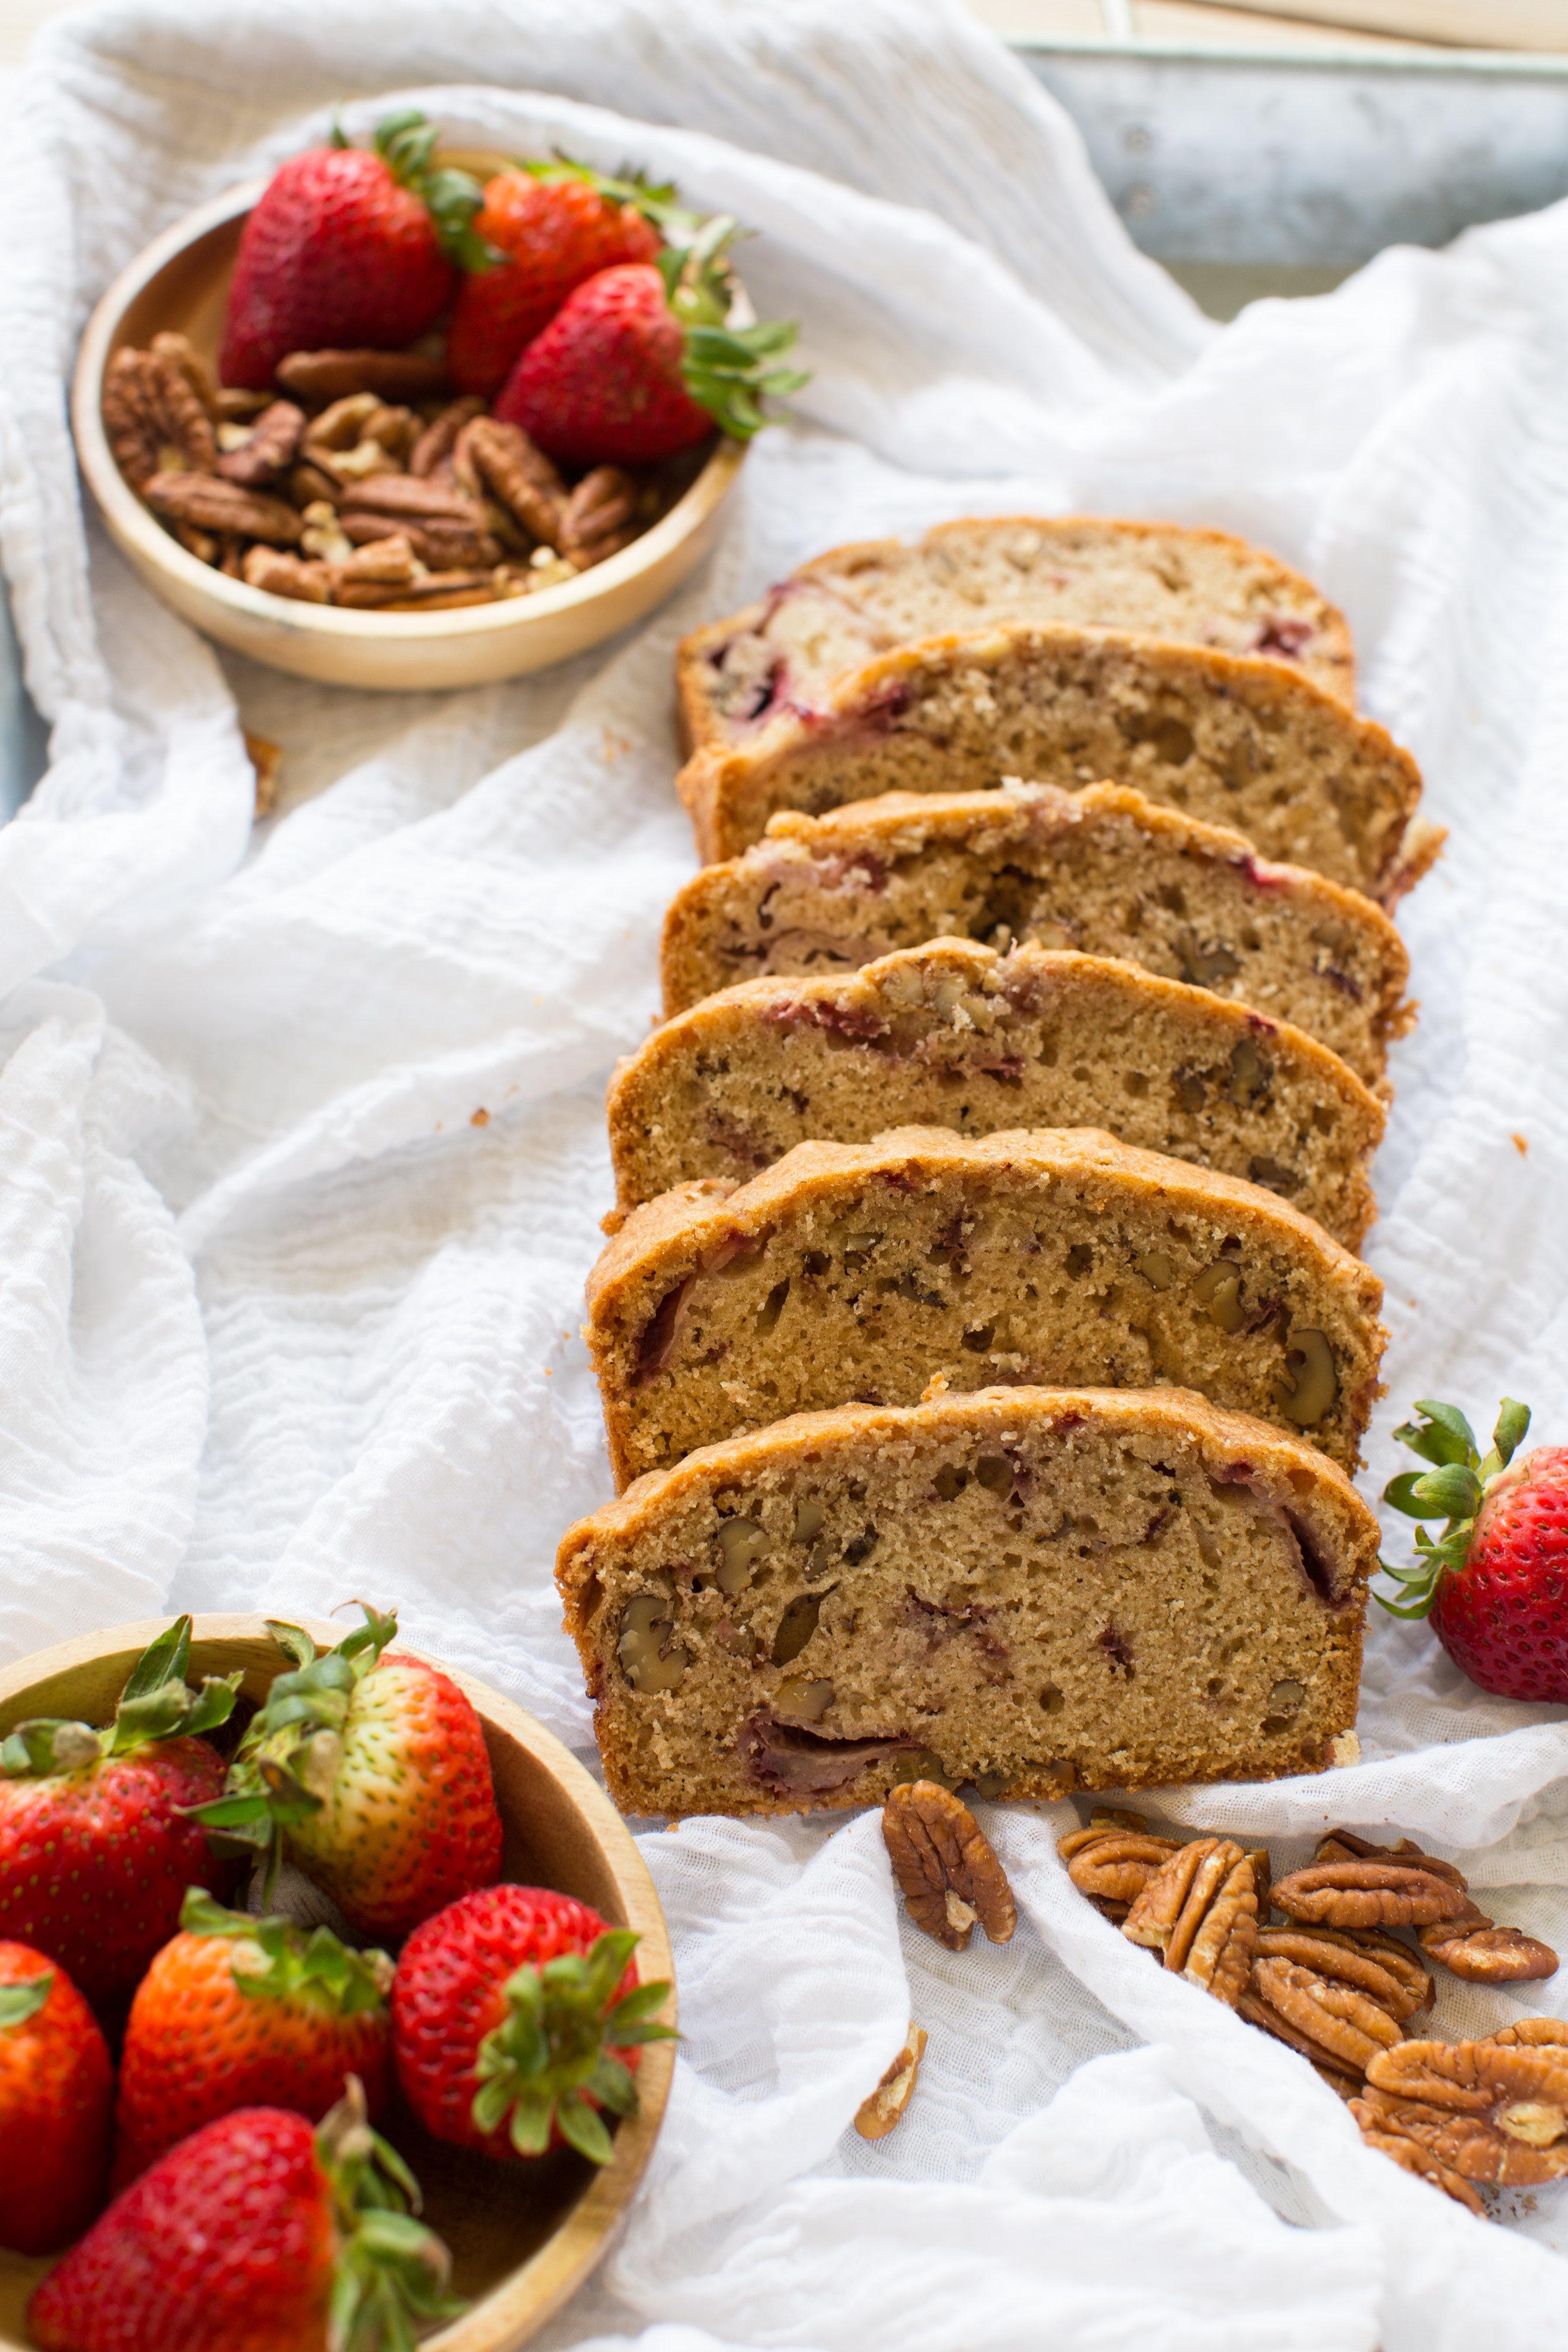 Strawberry-Pecan-Bread-recipe-vianneyrod